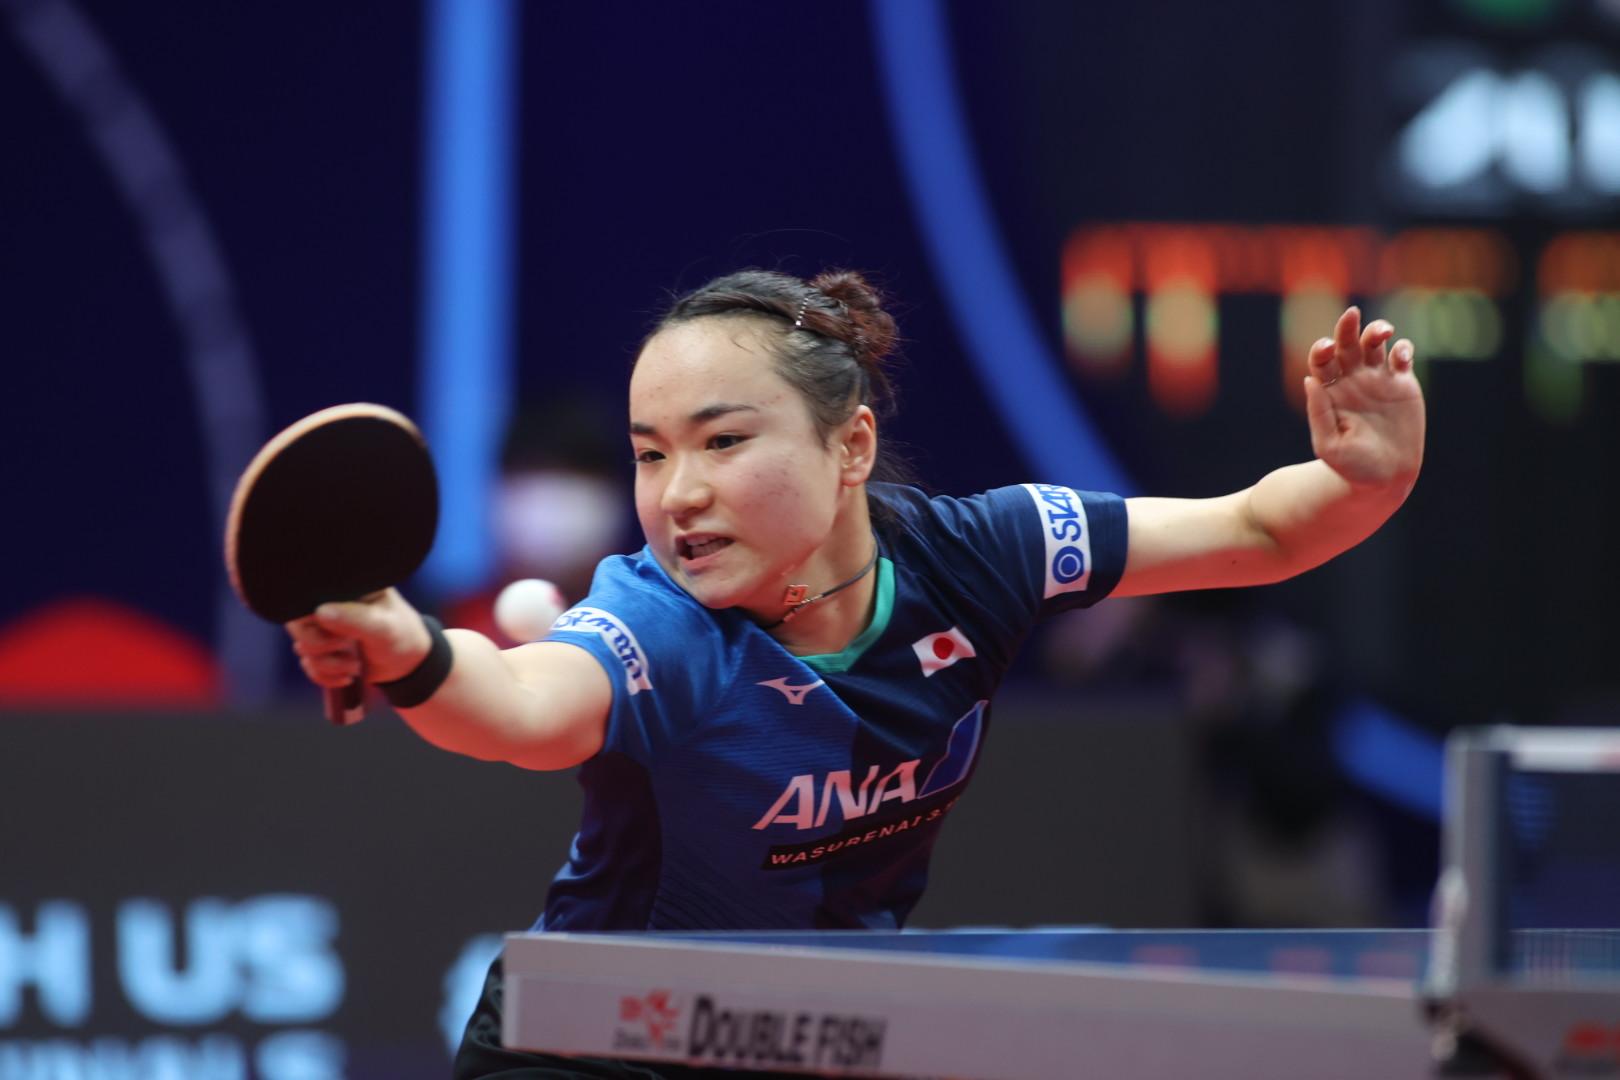 VICTAS VICTAS JOURNAL 卓球 ITTFファイナルズ 女子 伊藤美誠